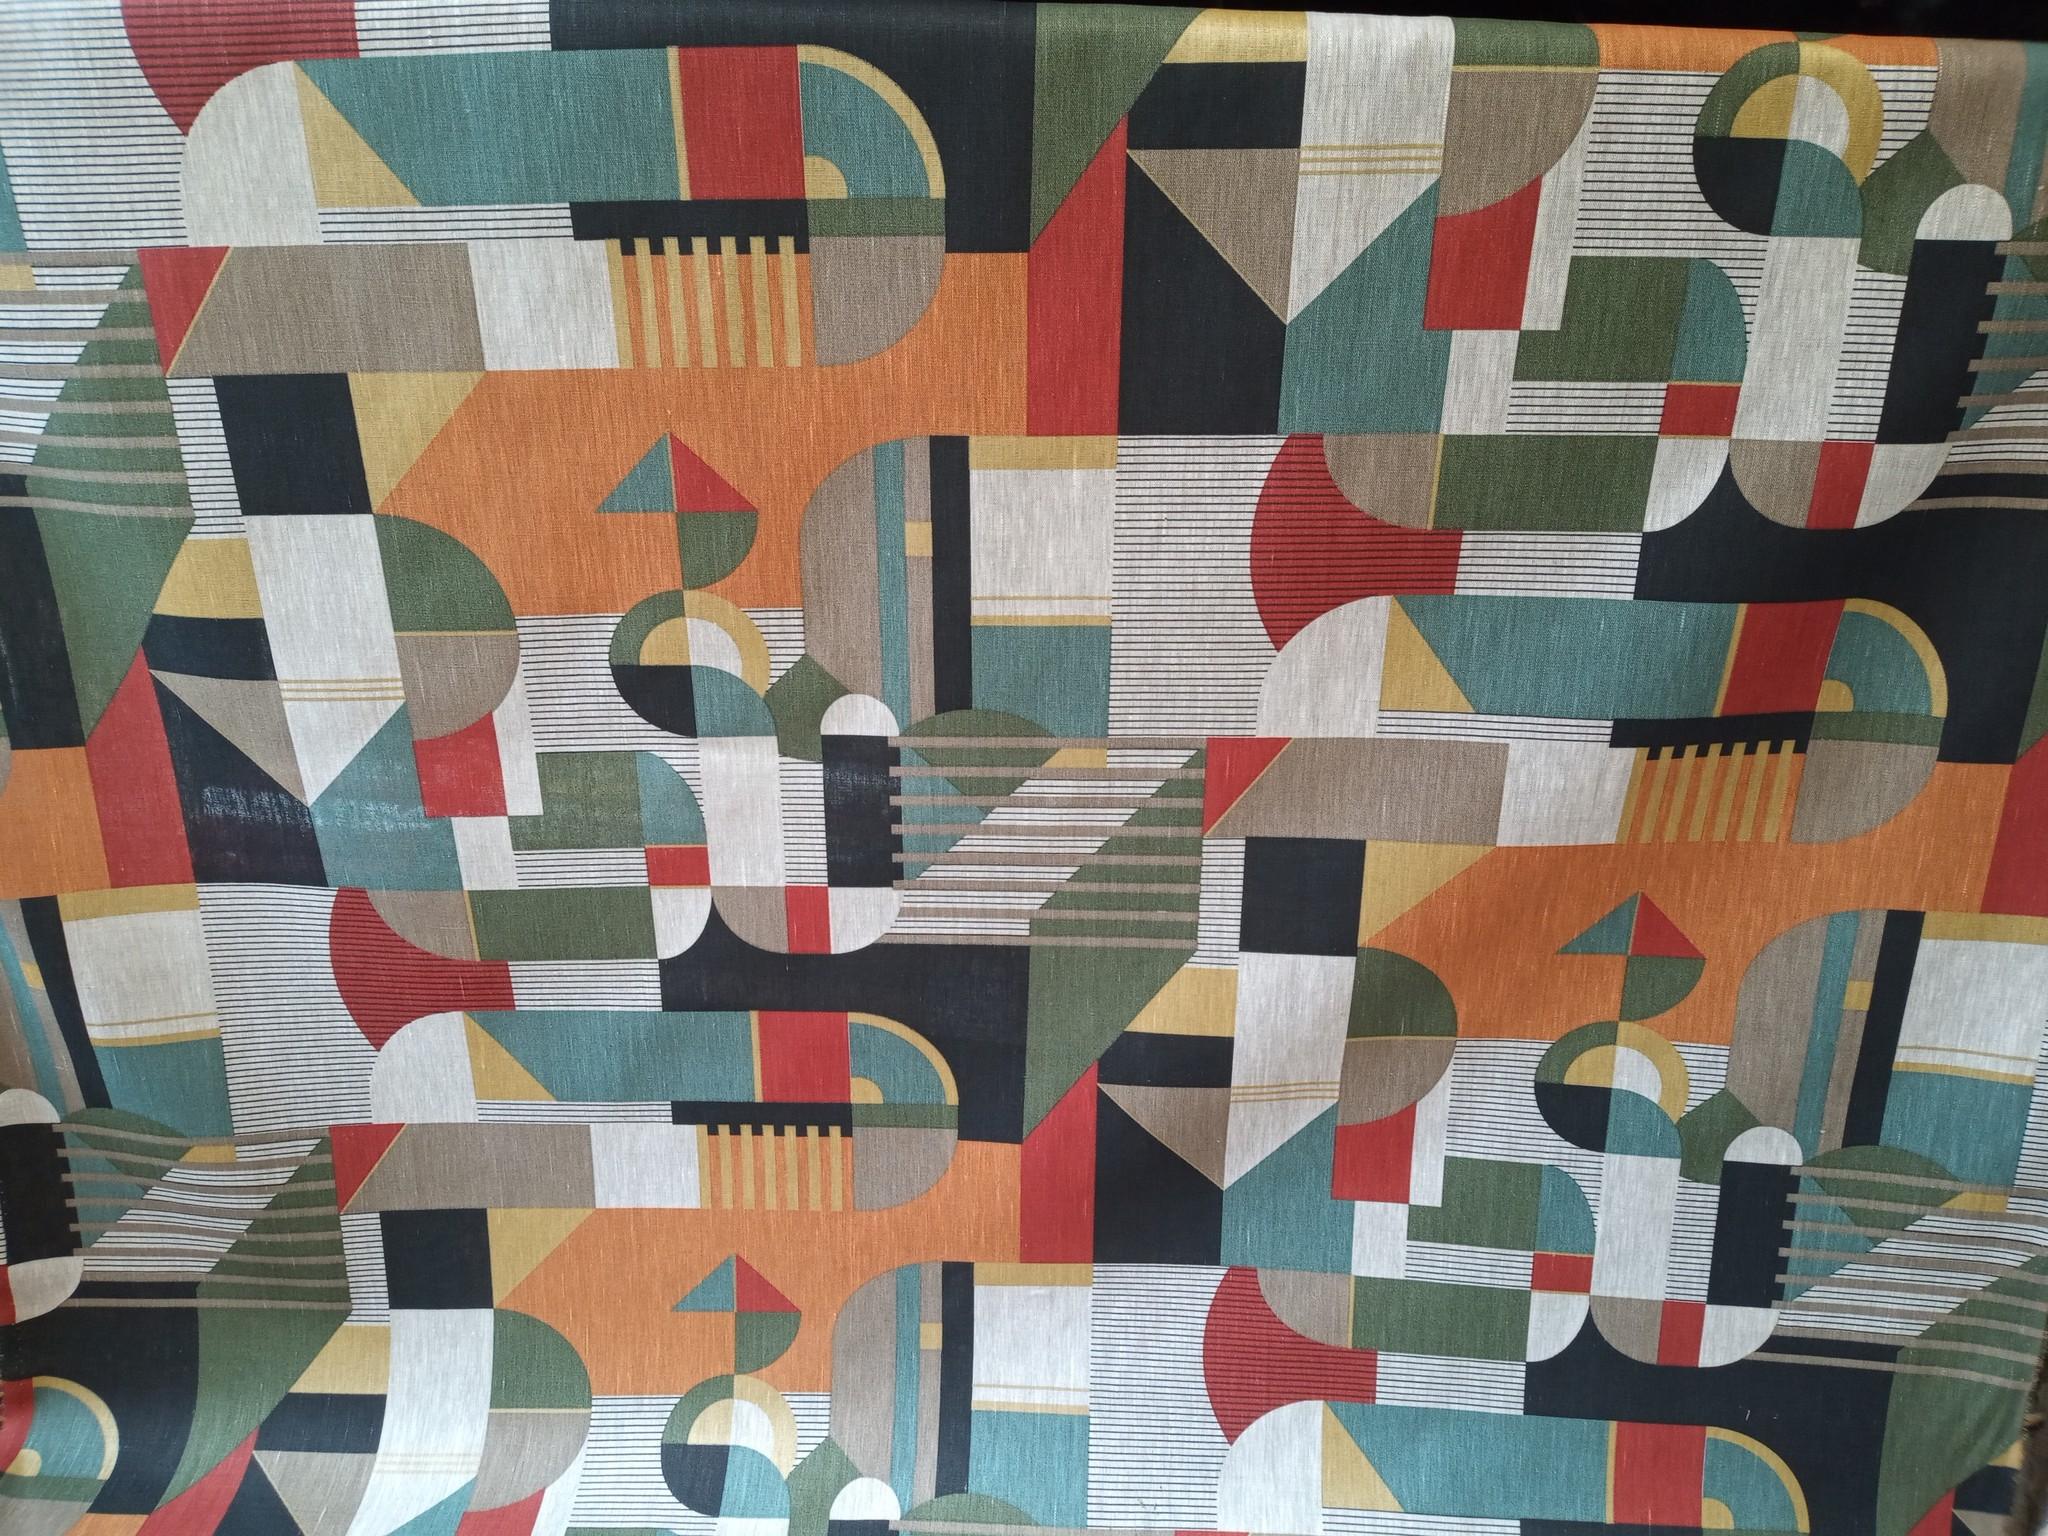 Delaunay fabric